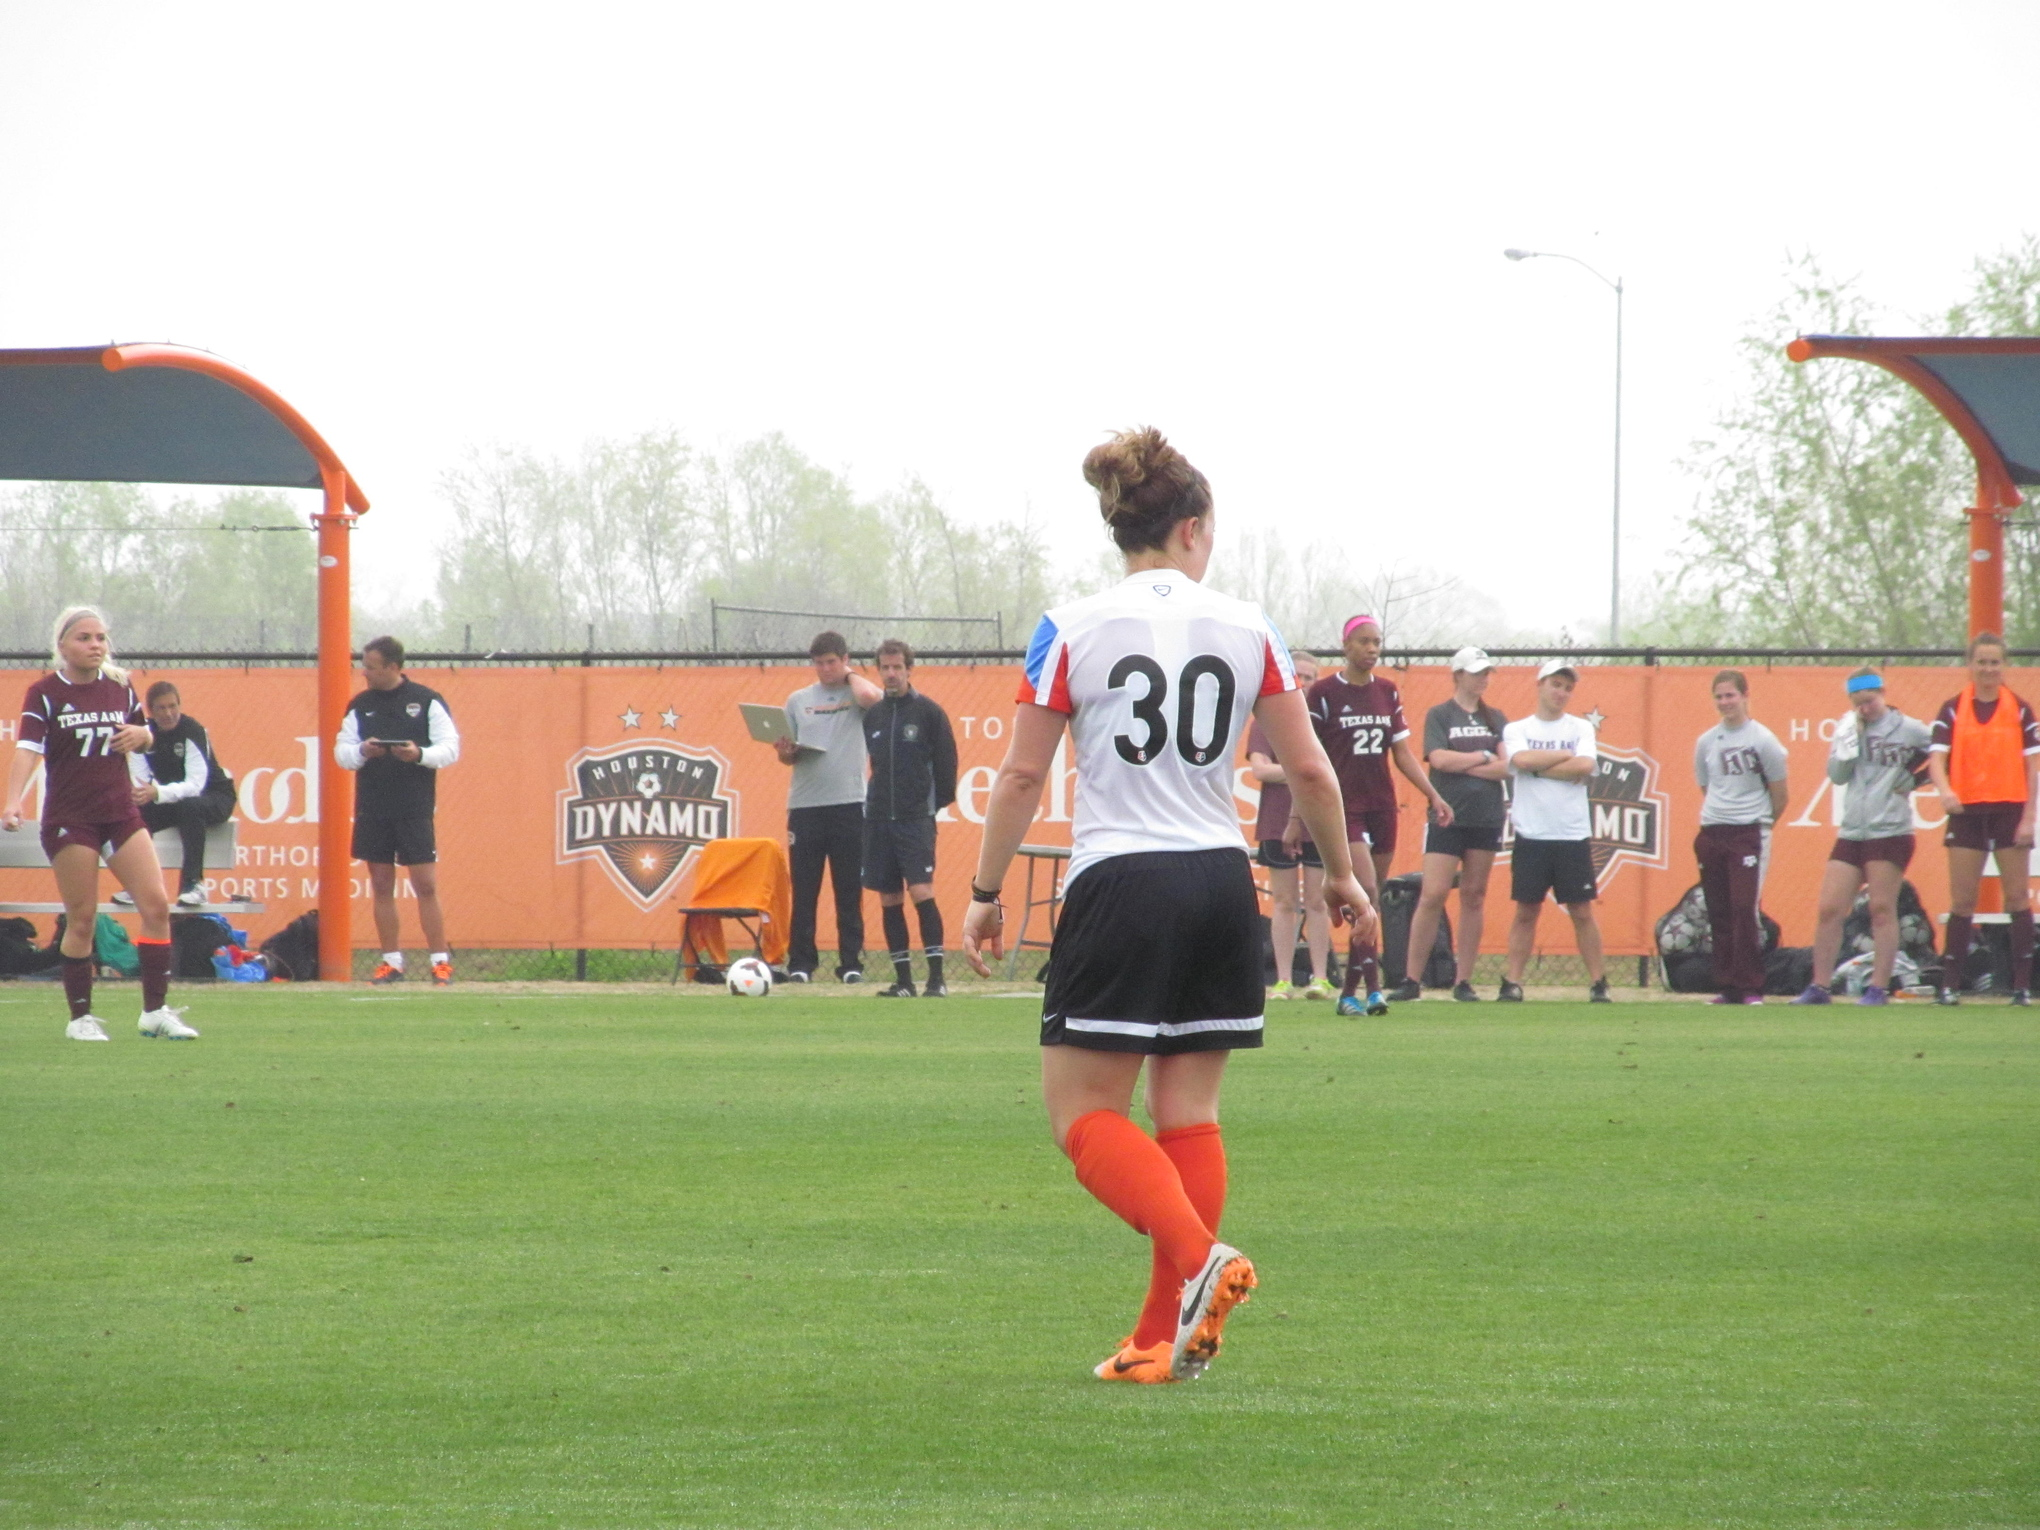 Ella Masar surveys the field in a game against Texas A&m